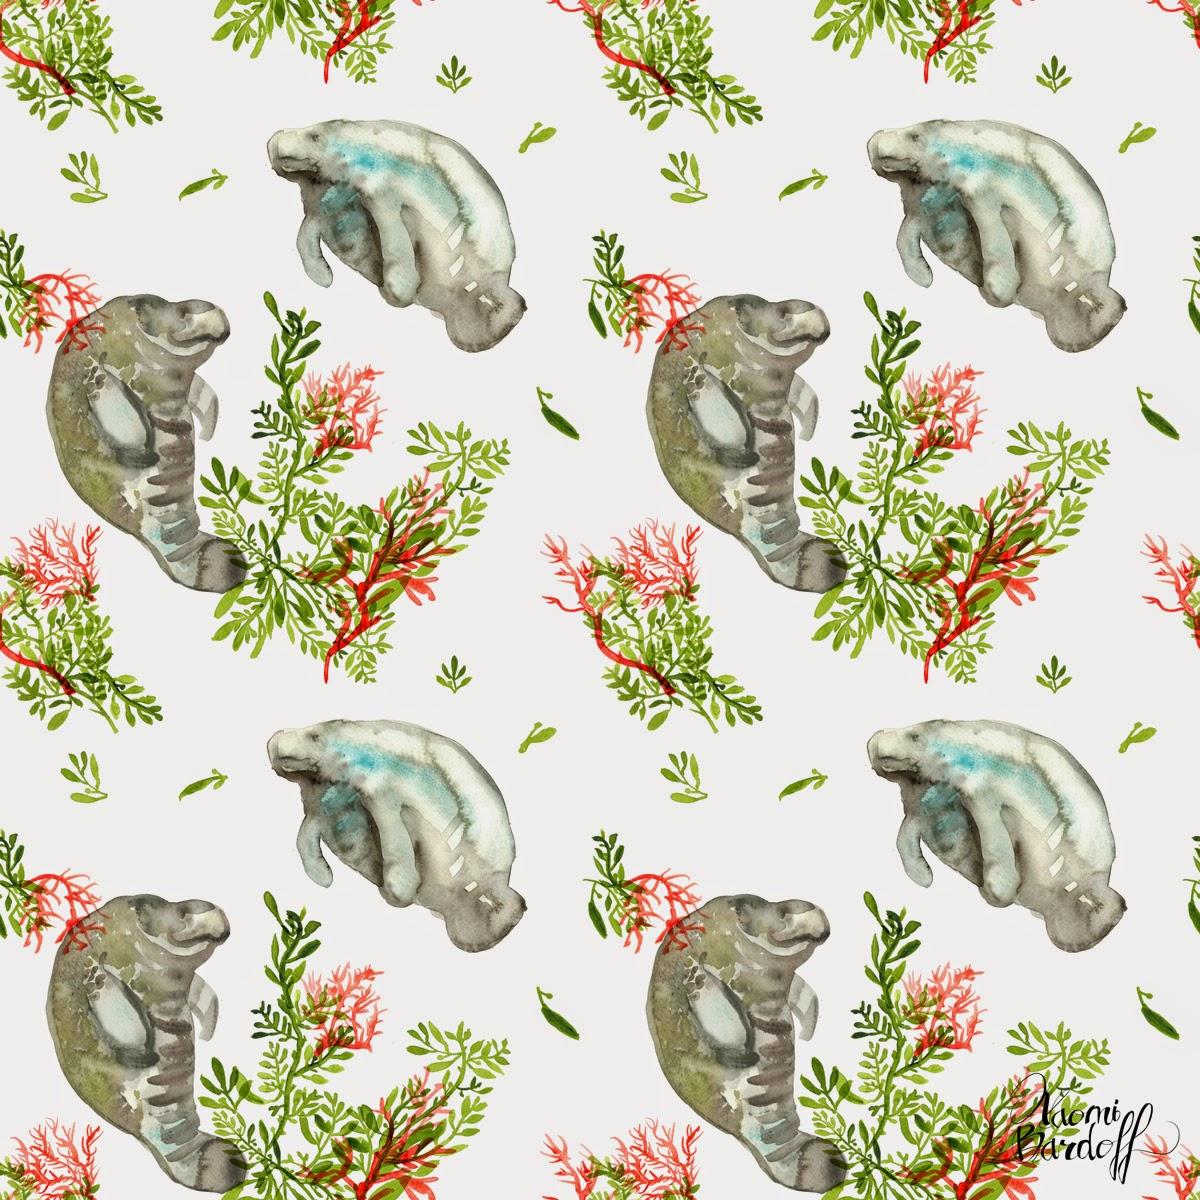 Desktop Wallpaper January 2014: Naomi Bardoff's Art Blog: Manatee, Seaweed, And